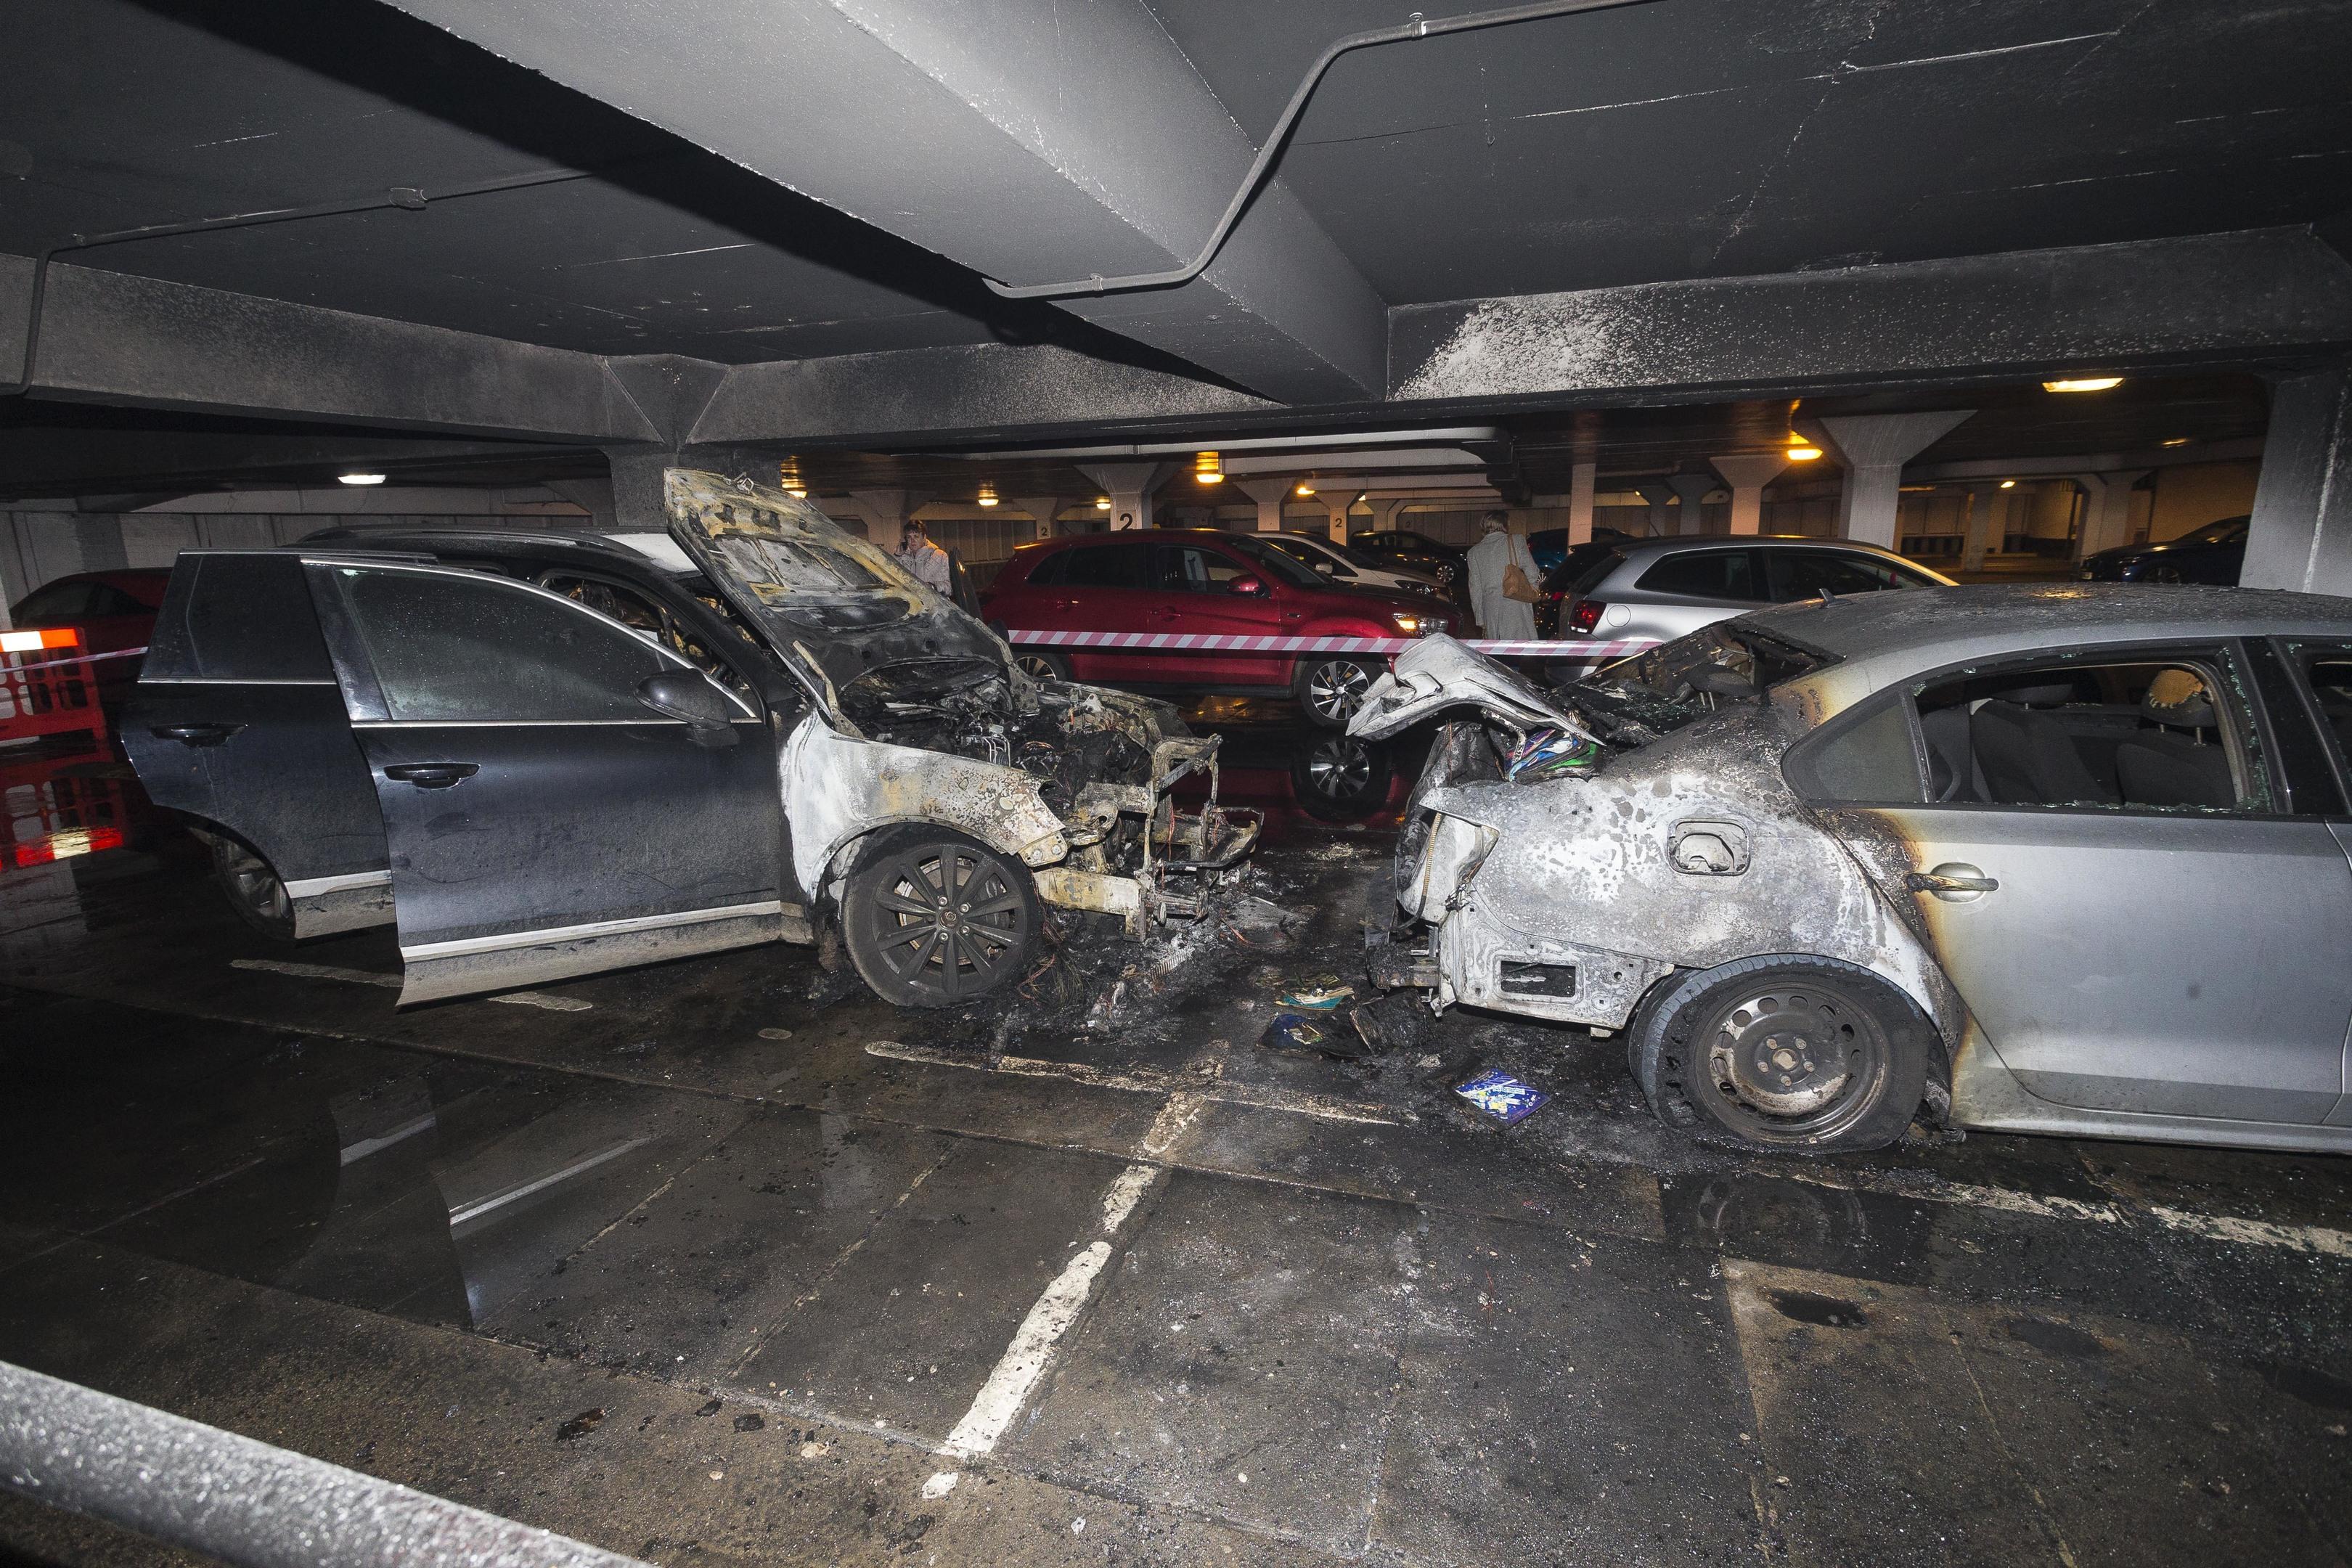 More than 40 firefighters battled the blaze at Denburn Car Park